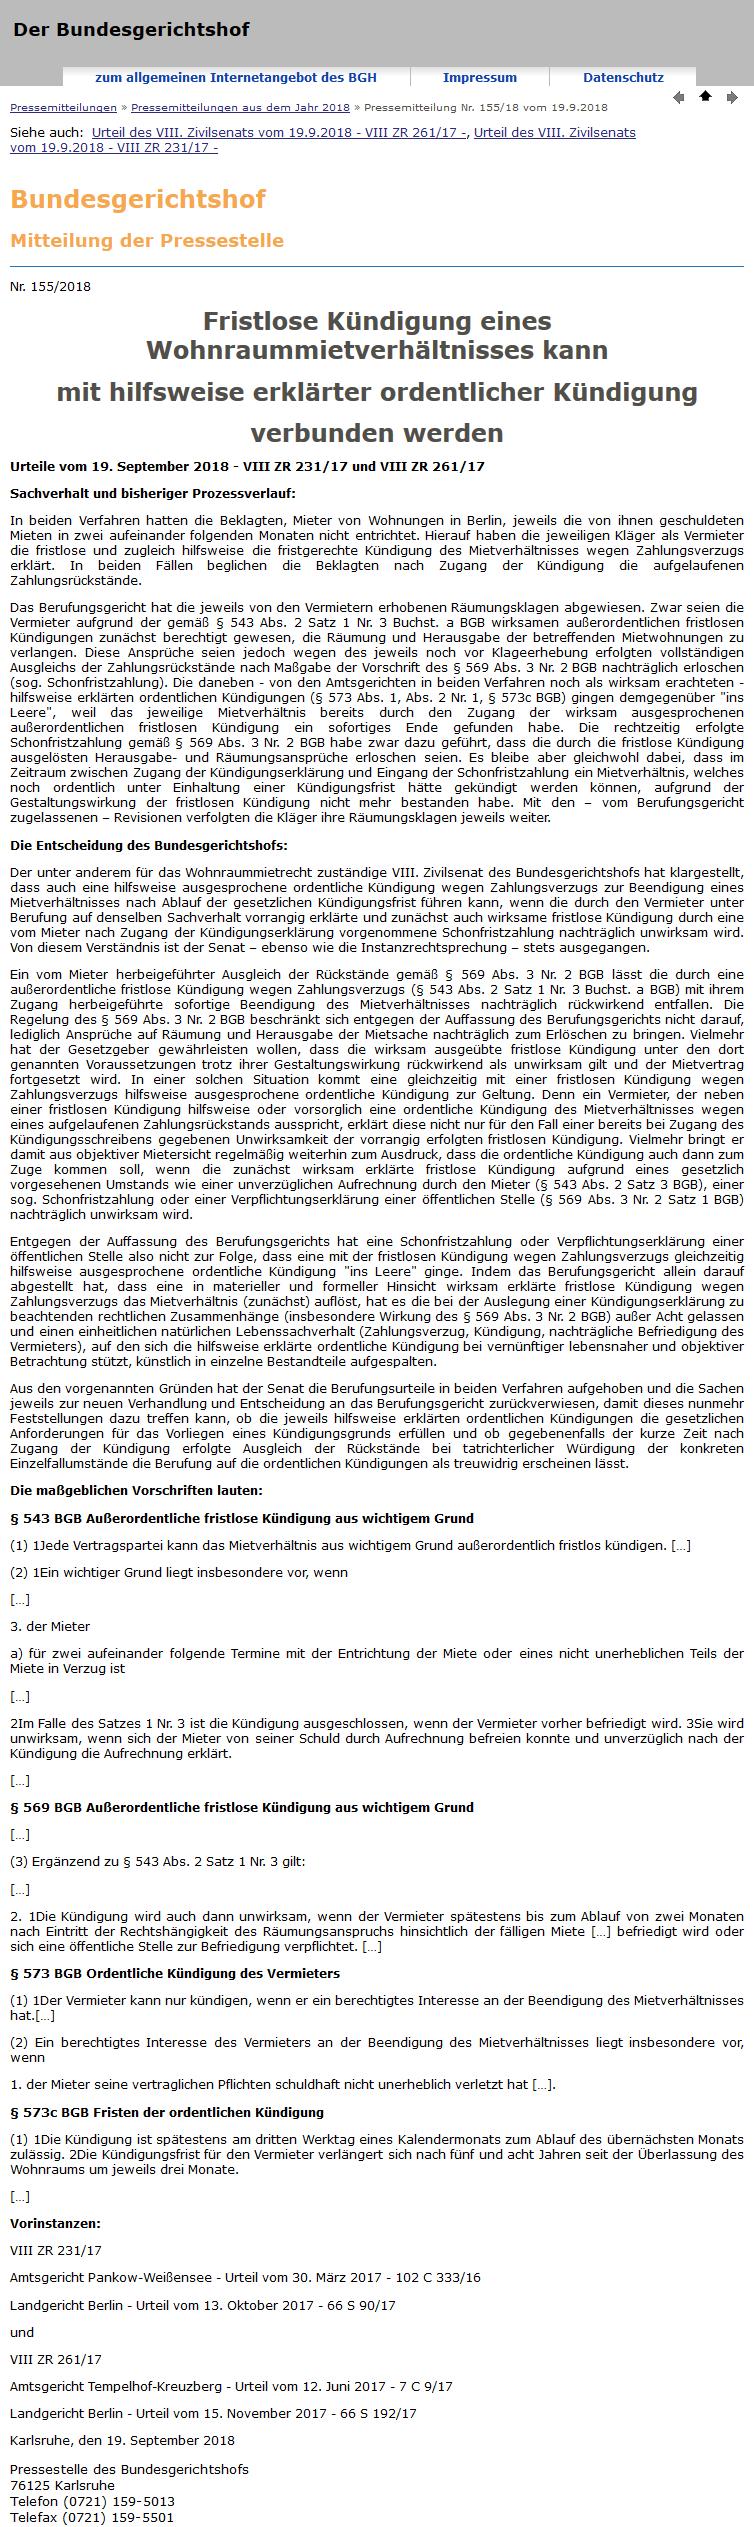 Kündigung Mietvertrag Durch Vermieter Bgb Hindu Tube